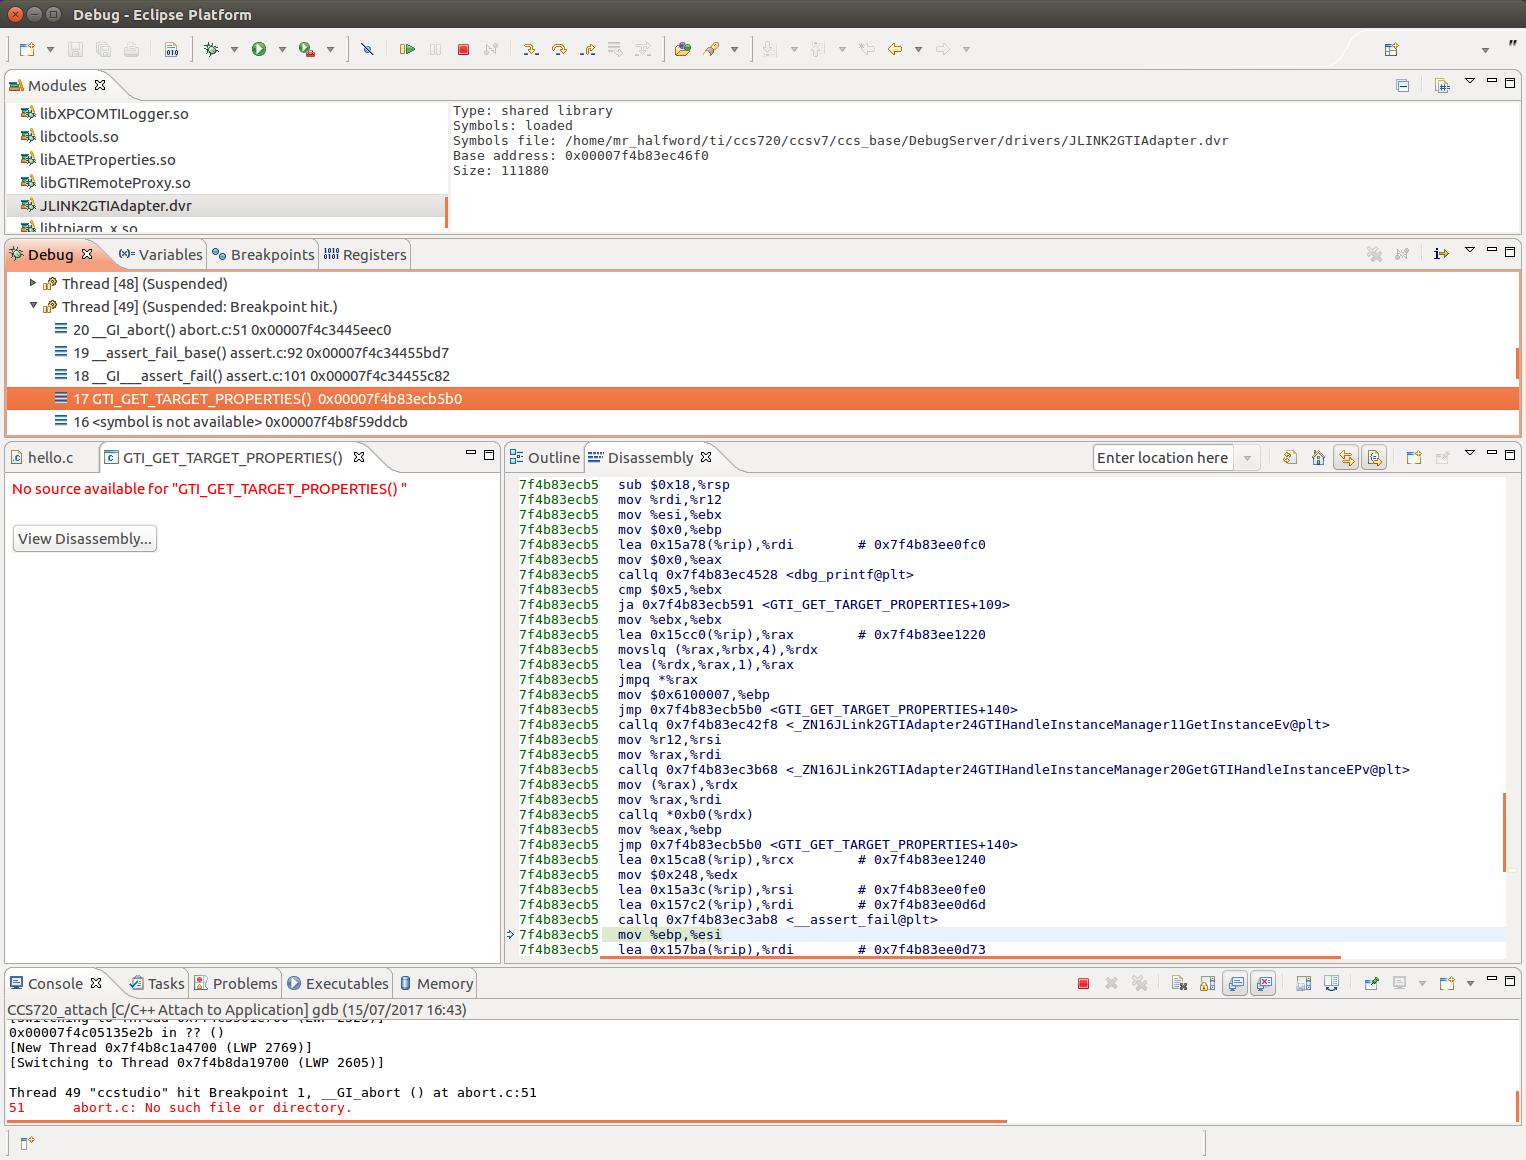 CCS/AM3352: CCS 7 2 0 00013 under Ubuntu 16 04 crashes with